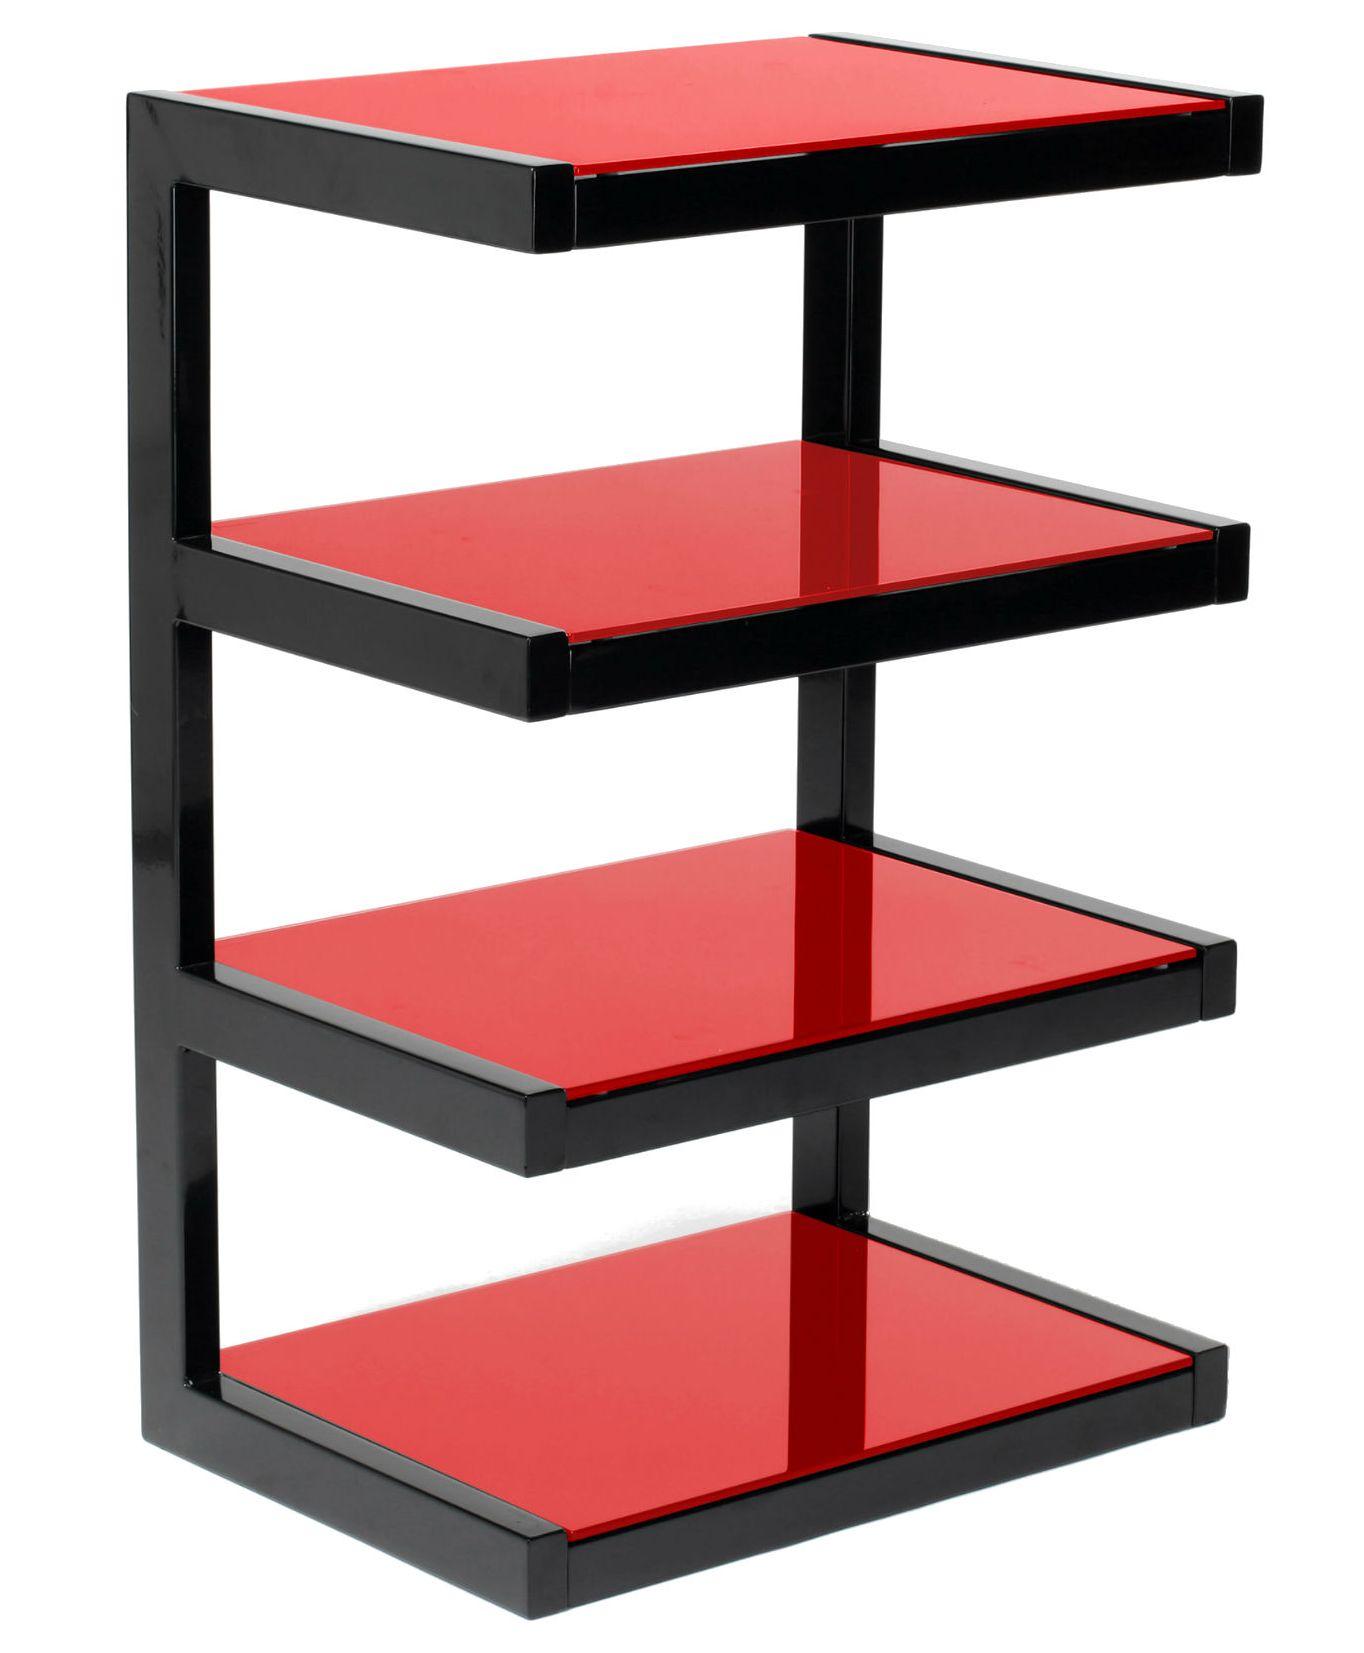 norstone meuble hifi esse rouge meuble tv hifi suisse. Black Bedroom Furniture Sets. Home Design Ideas